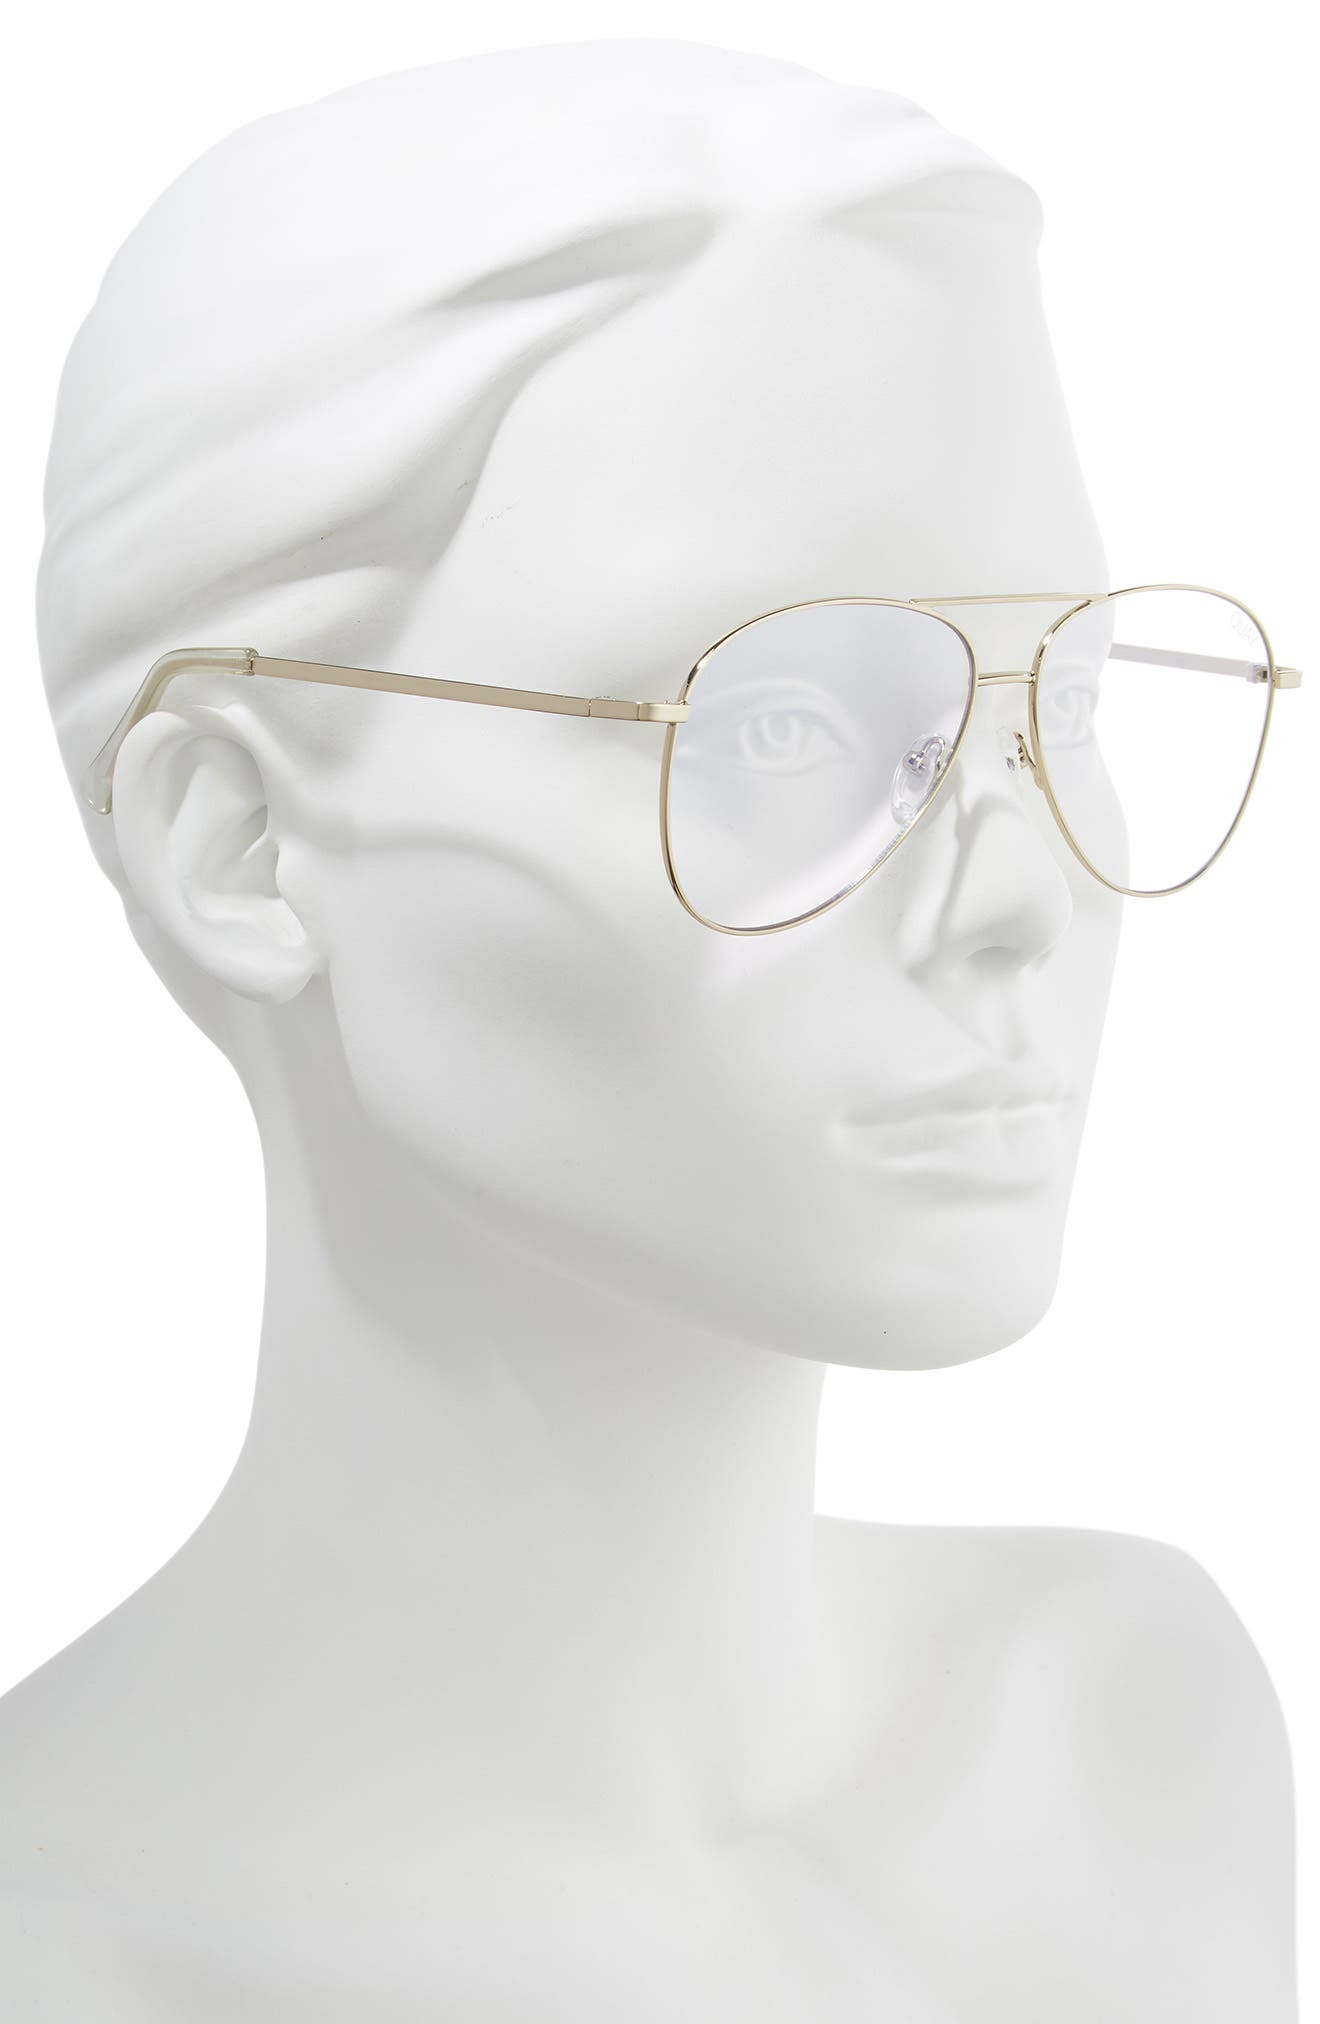 Still Standing 58mm Aviator Fashion Glasses,                             Alternate thumbnail 2, color,                             GOLD / CLEAR BLUE LIGHT